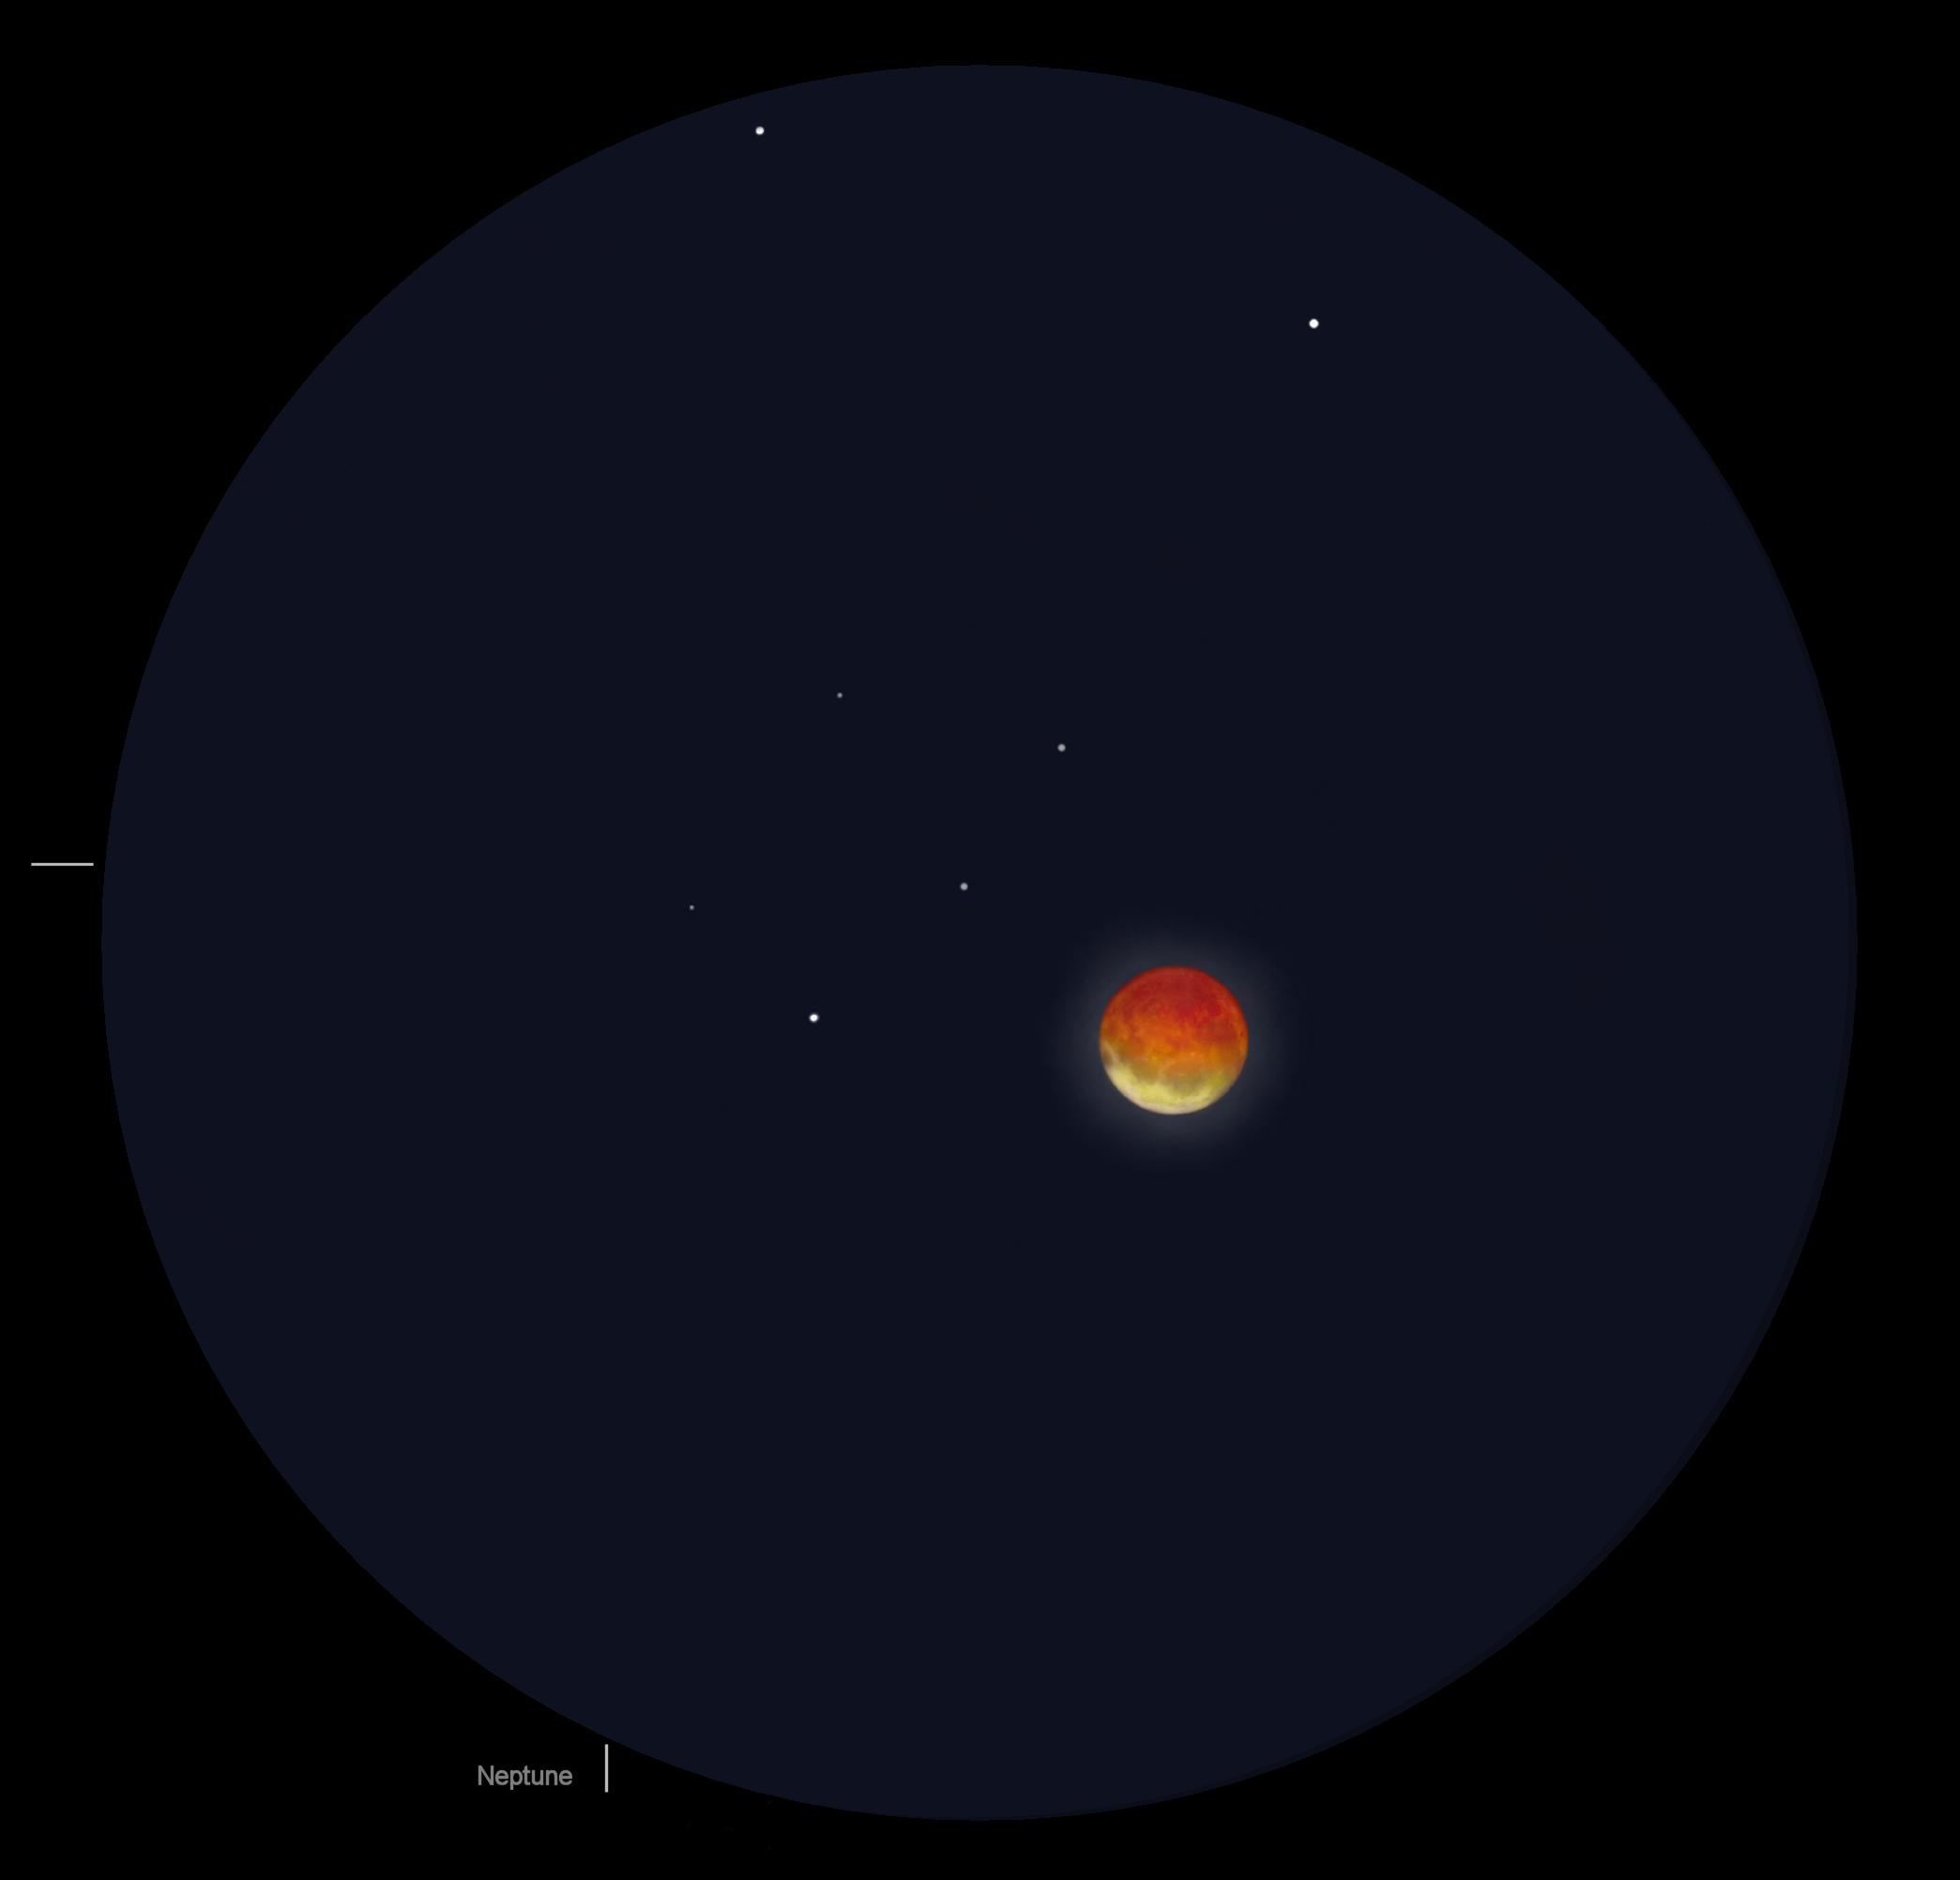 http://ekladata.com/splendeursducielprofond.eklablog.fr/perso/dessins%20divers/eclipse-Lune-Neptune-16-08-2008-L60-md-3.png